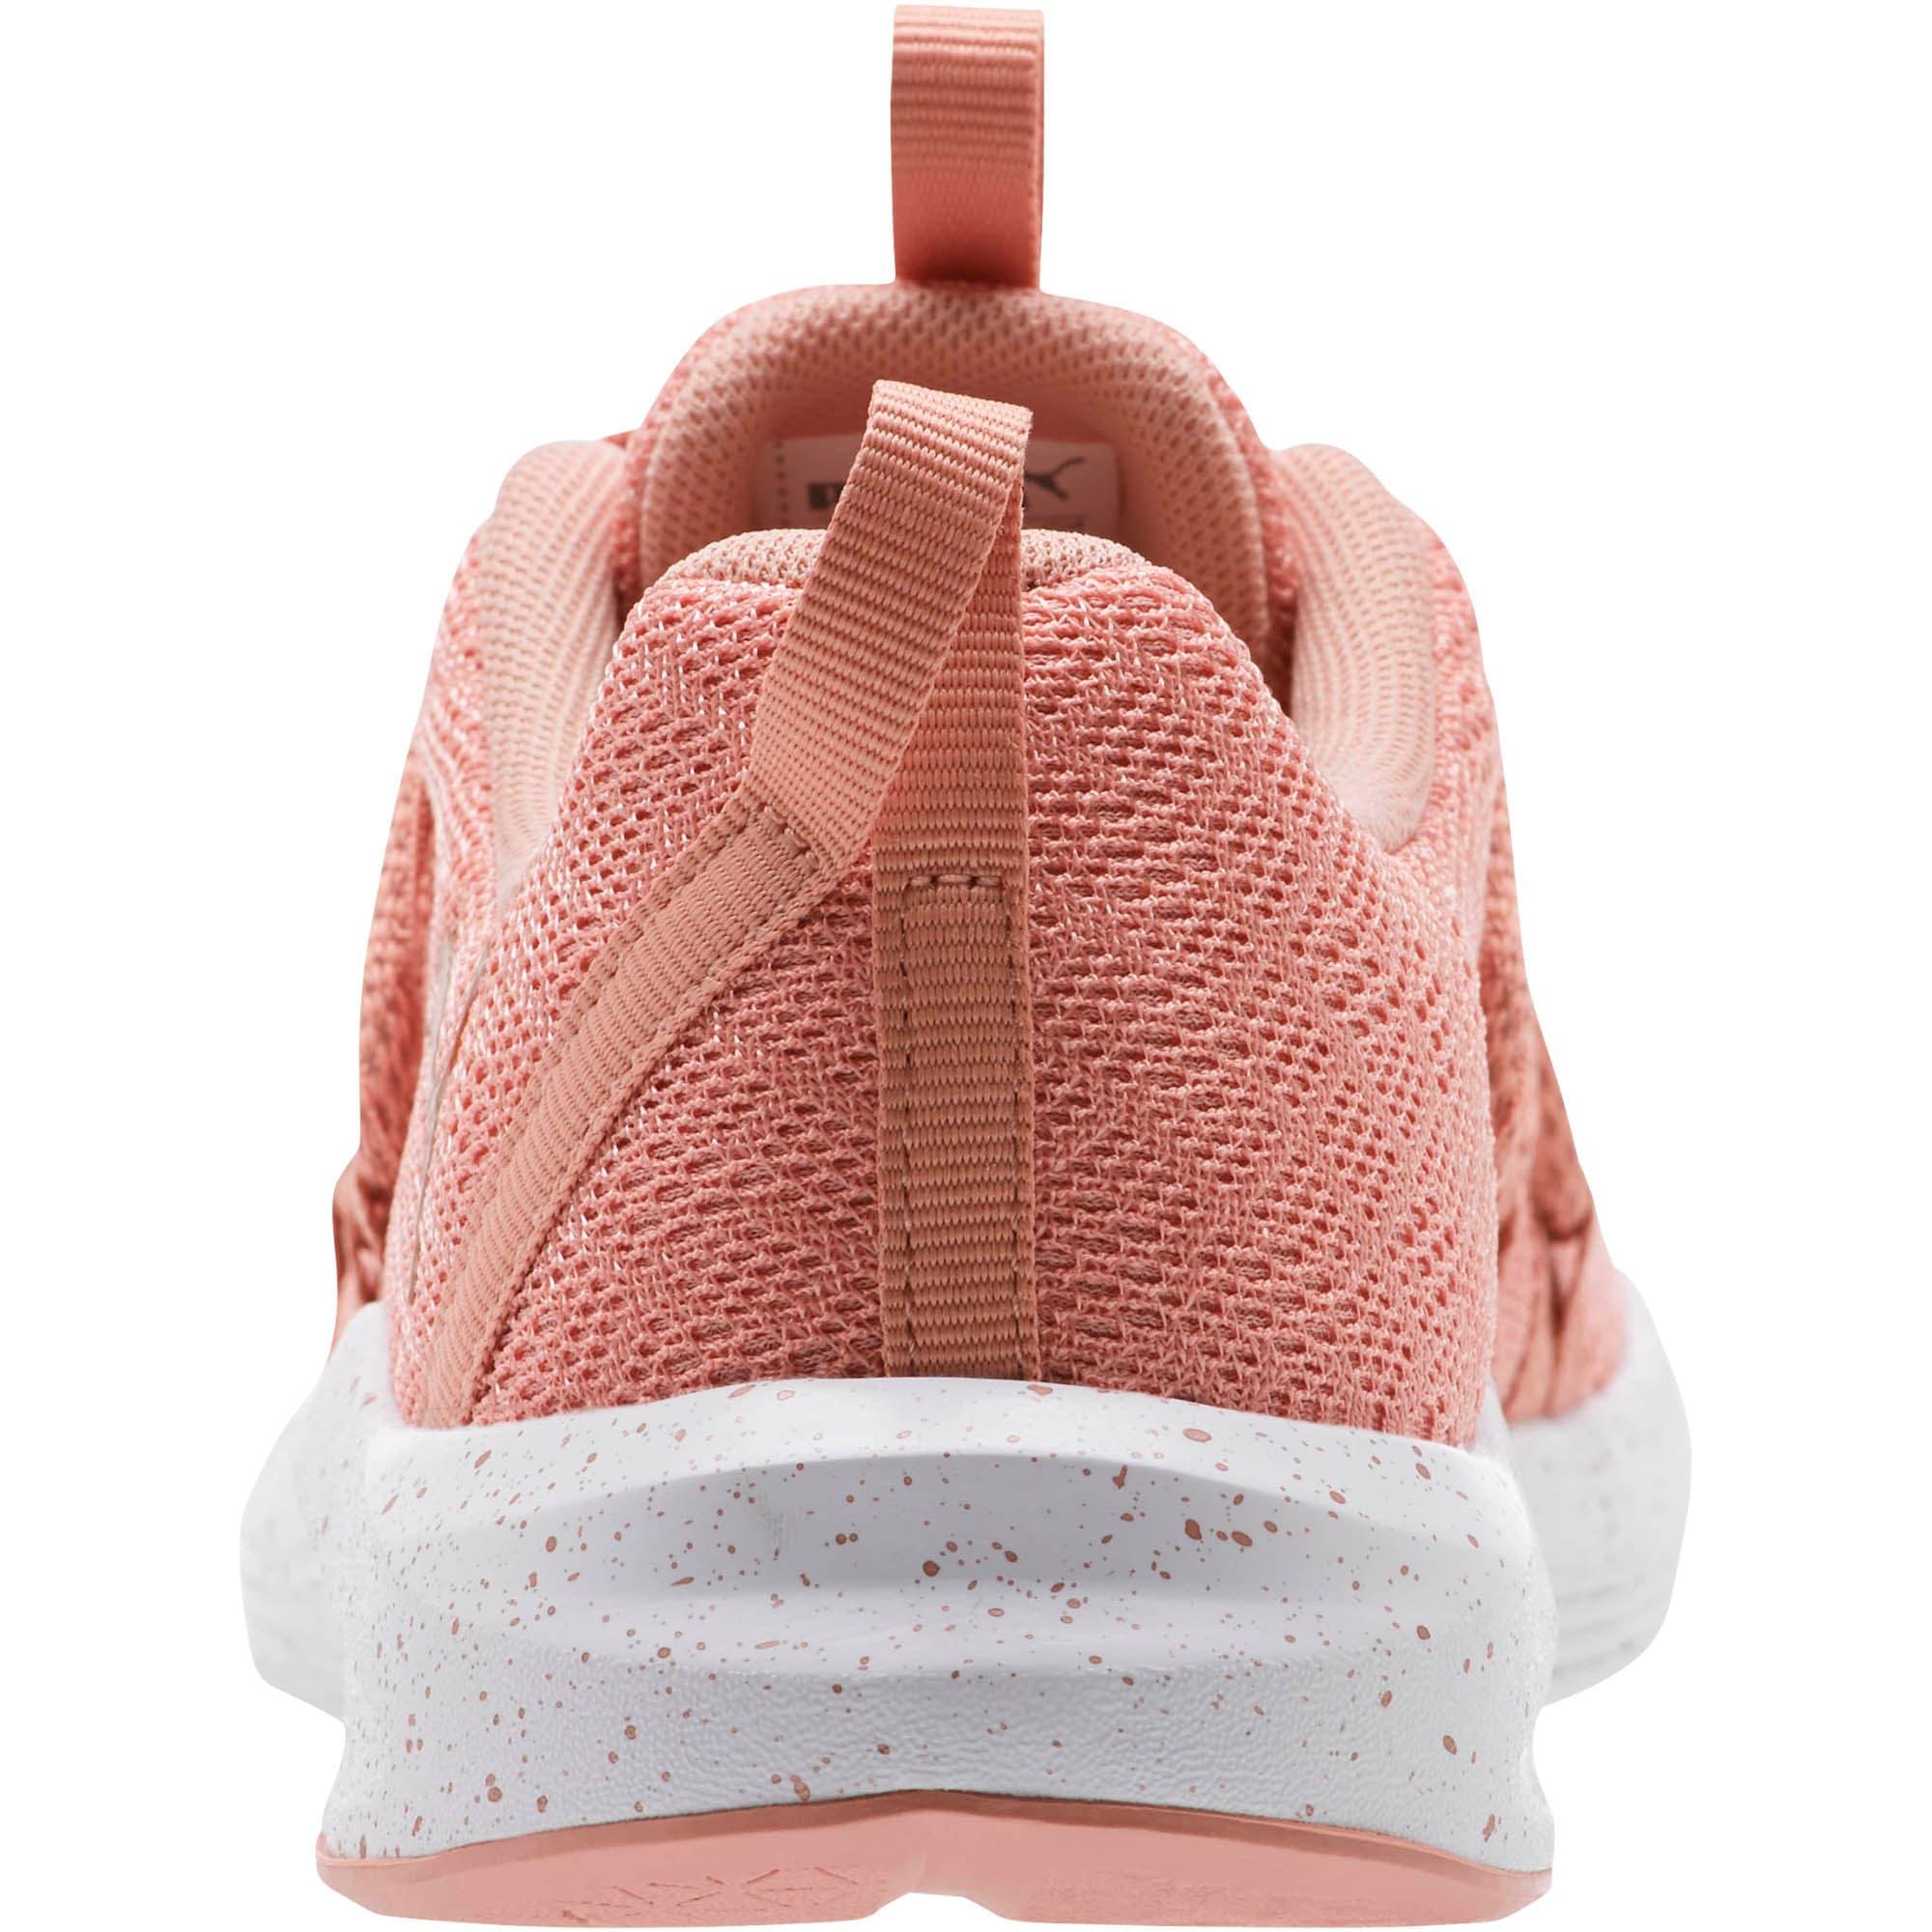 Thumbnail 4 of Prowl Alt Mesh Speckle Women's Training Shoes, Peach Beige-Puma White, medium